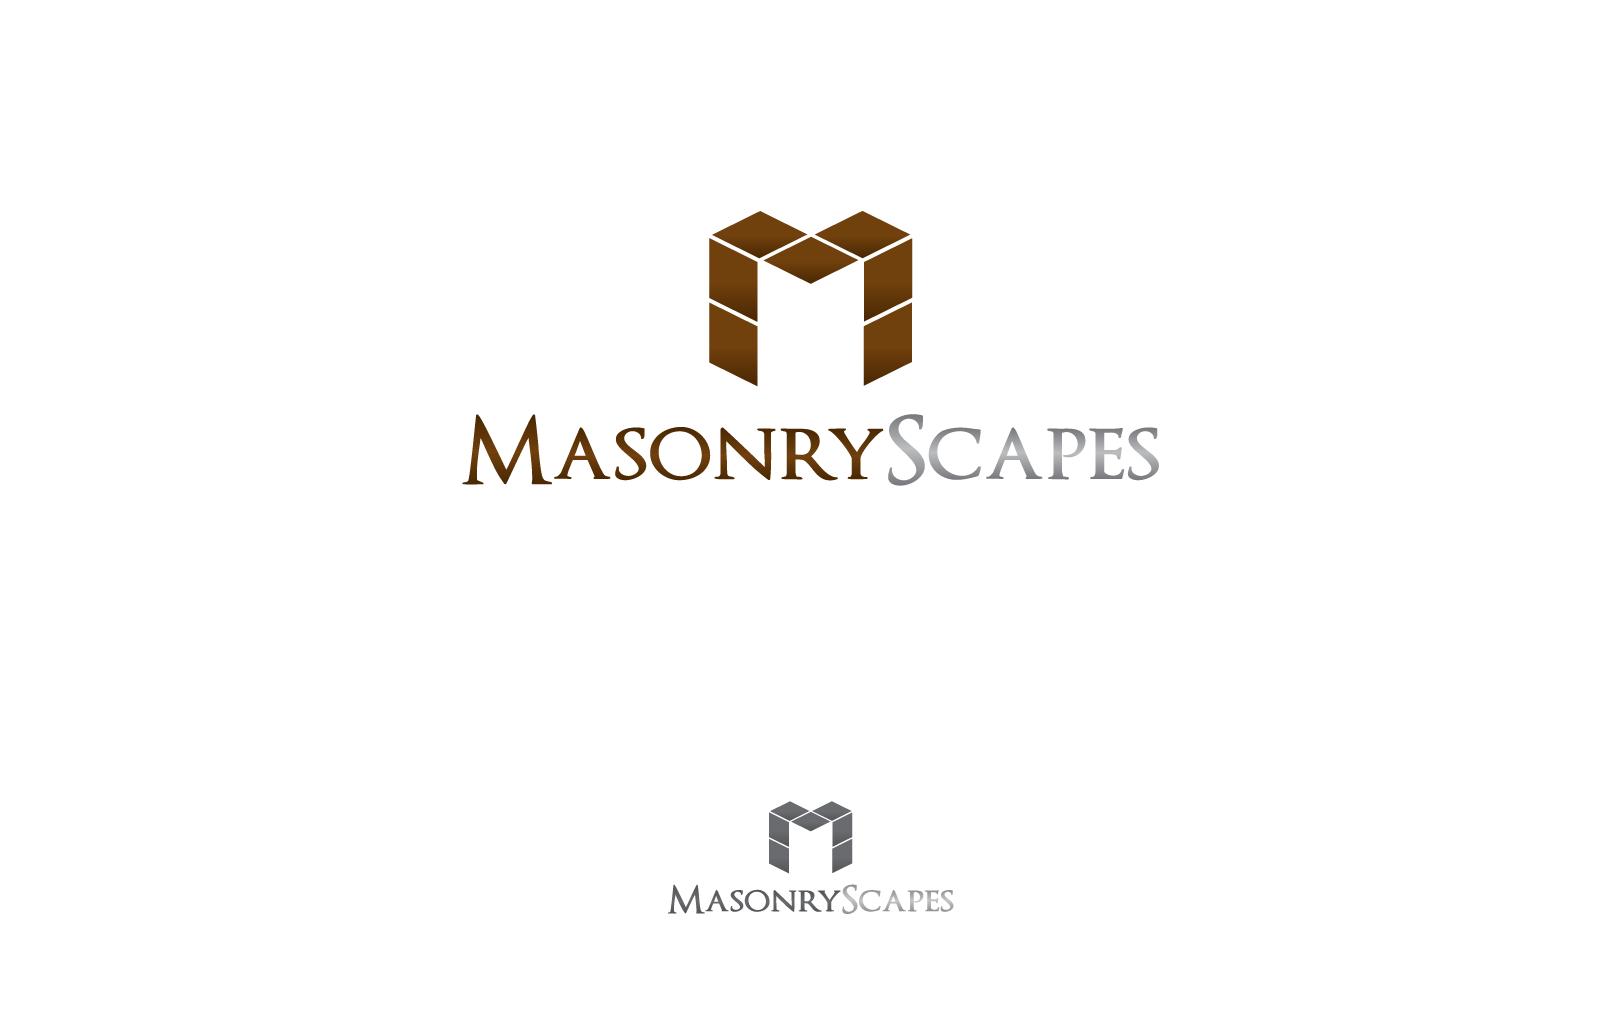 logo for MasonryScapes